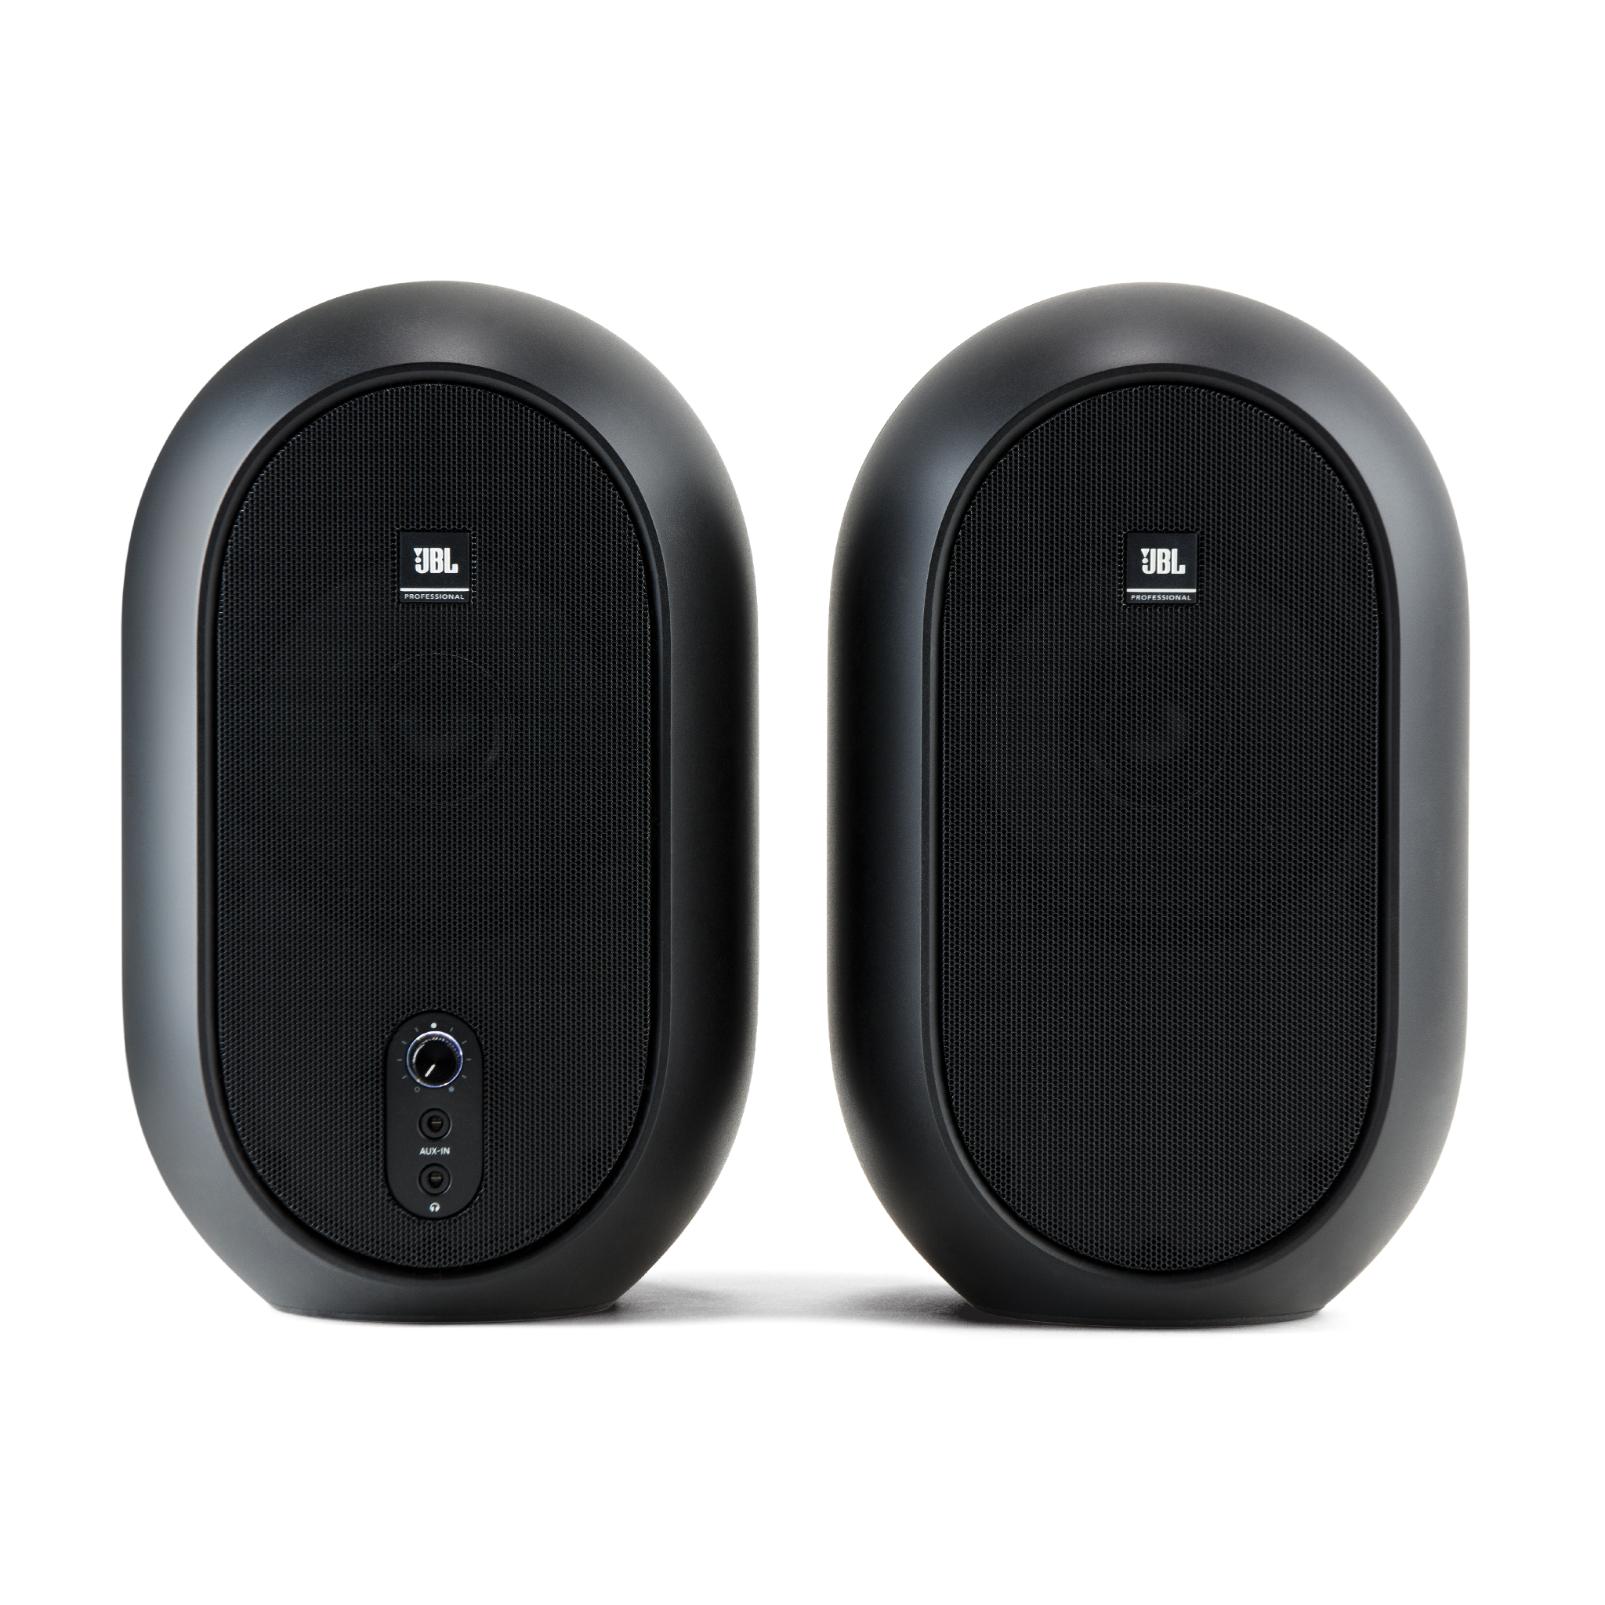 JBL 104 (Pair) (B-Stock) - Black - Compact Powered Desktop Reference Monitors - Front